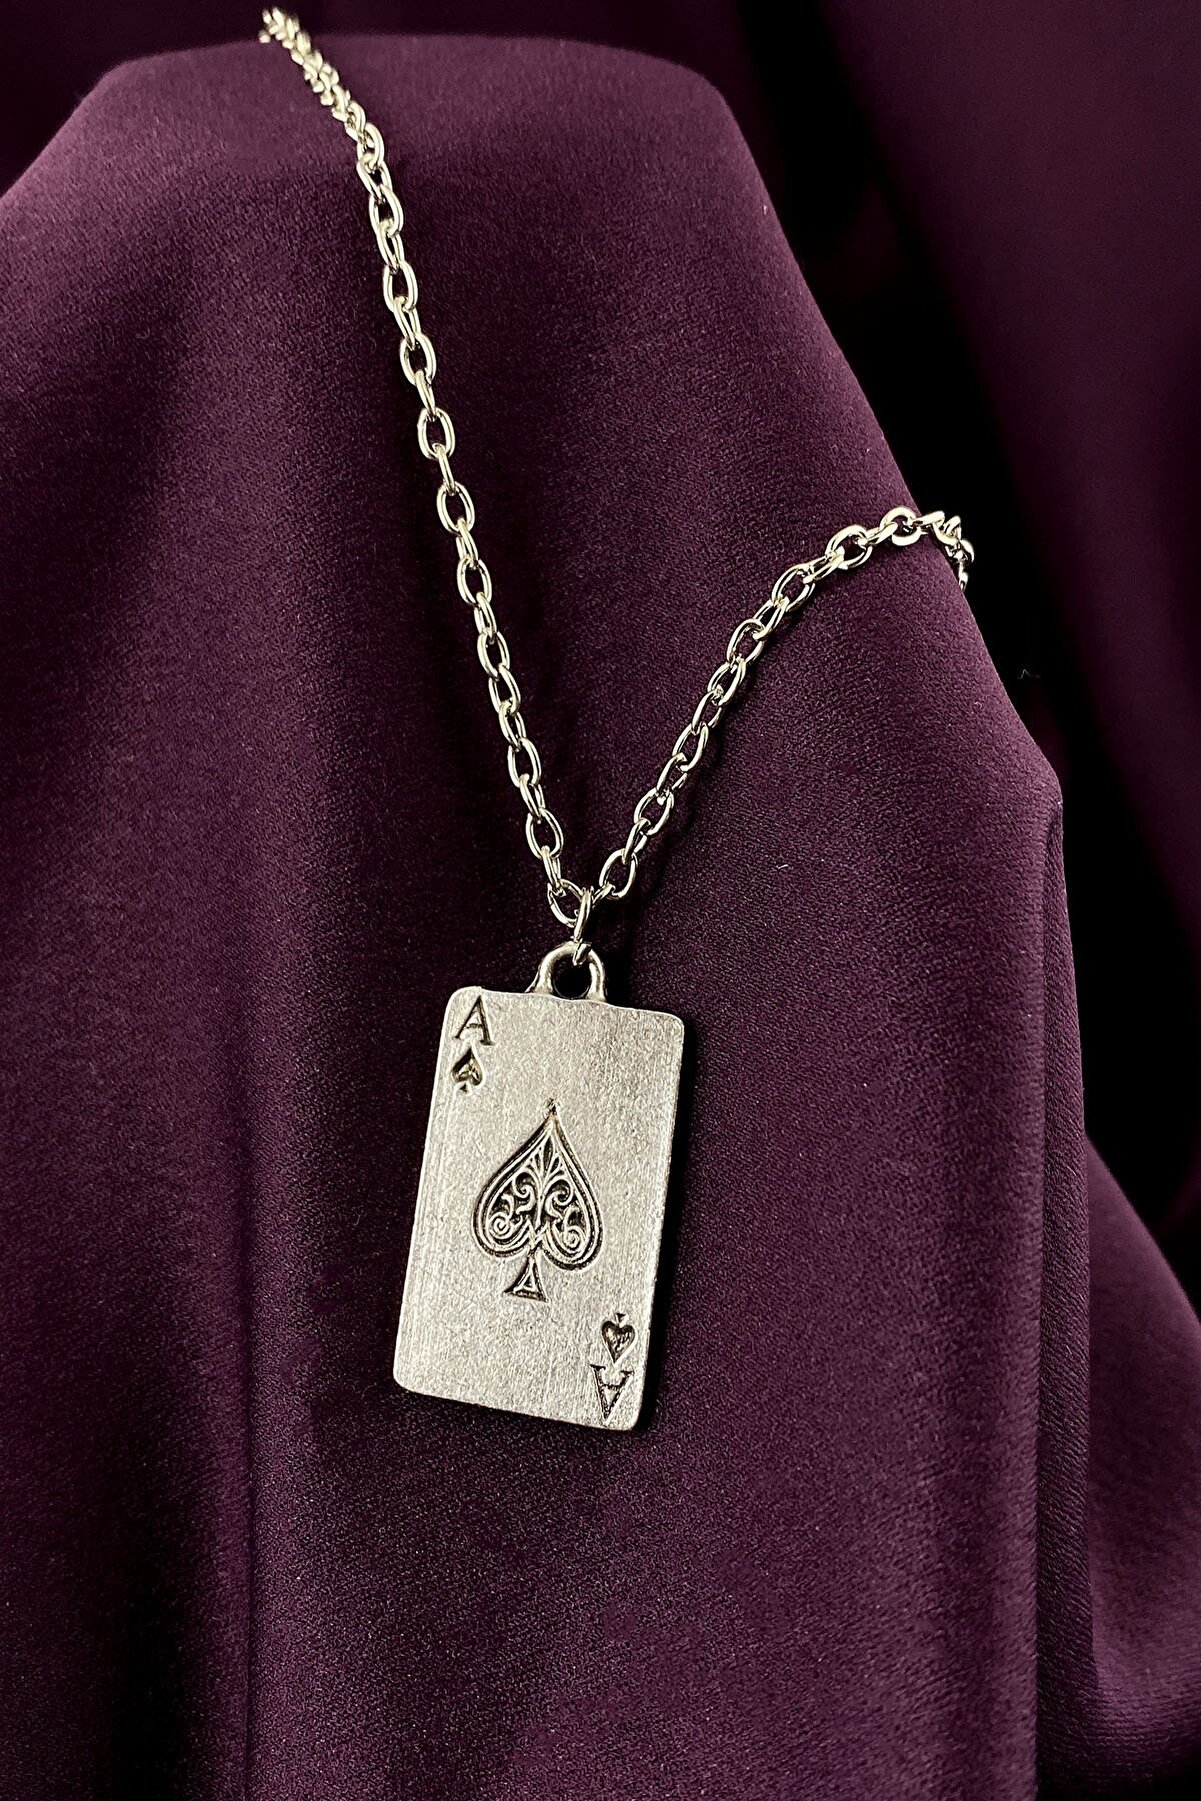 MOONİ ACCESSORİES Maça As Poker İskambil Mat Gümüş Kaplama Zincir Kolye